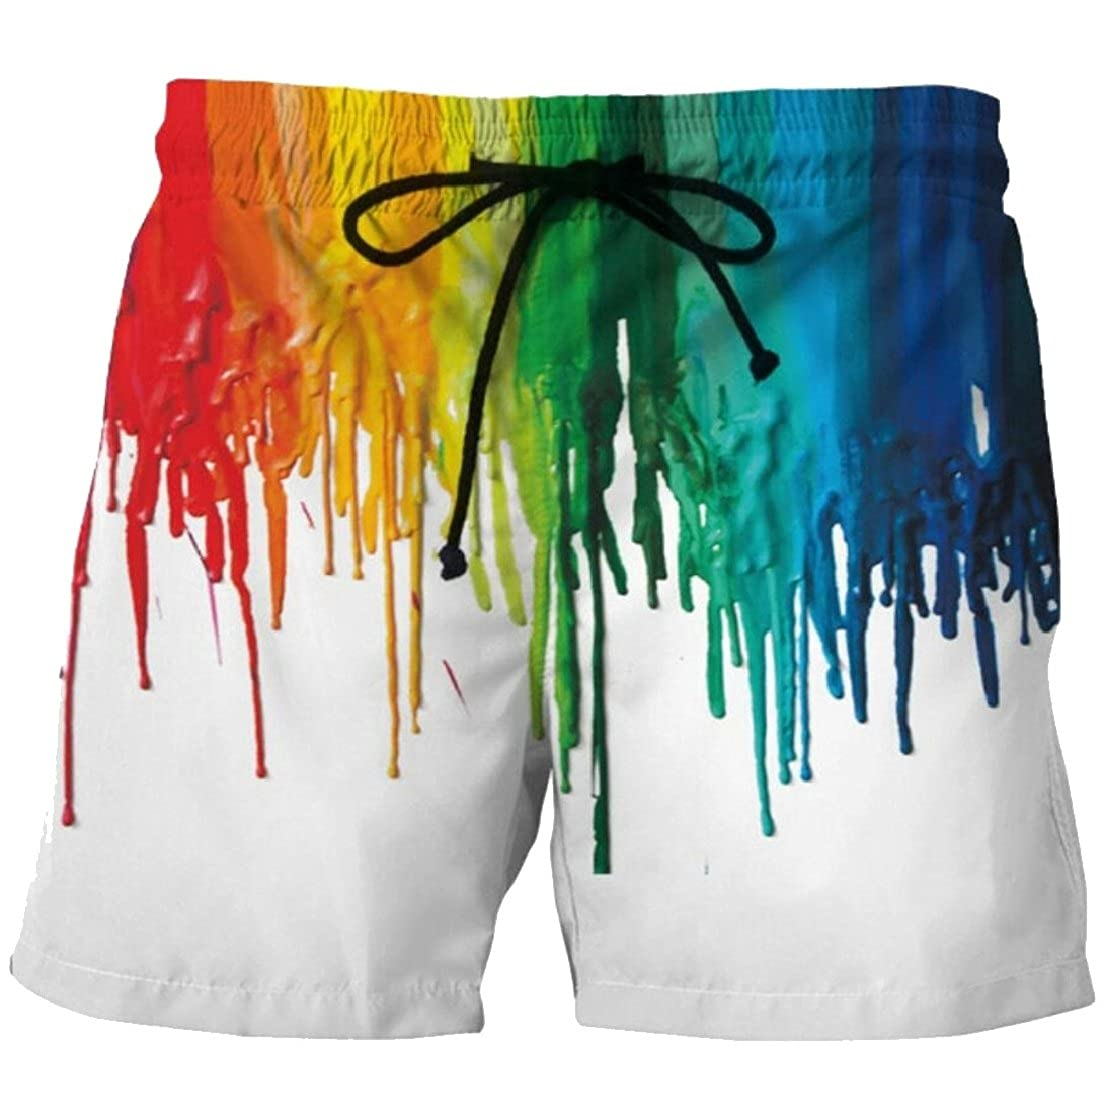 Gocgt Mens Stretchy Waist Strappy Tie Dye Printed Slant Pockets Beachwear